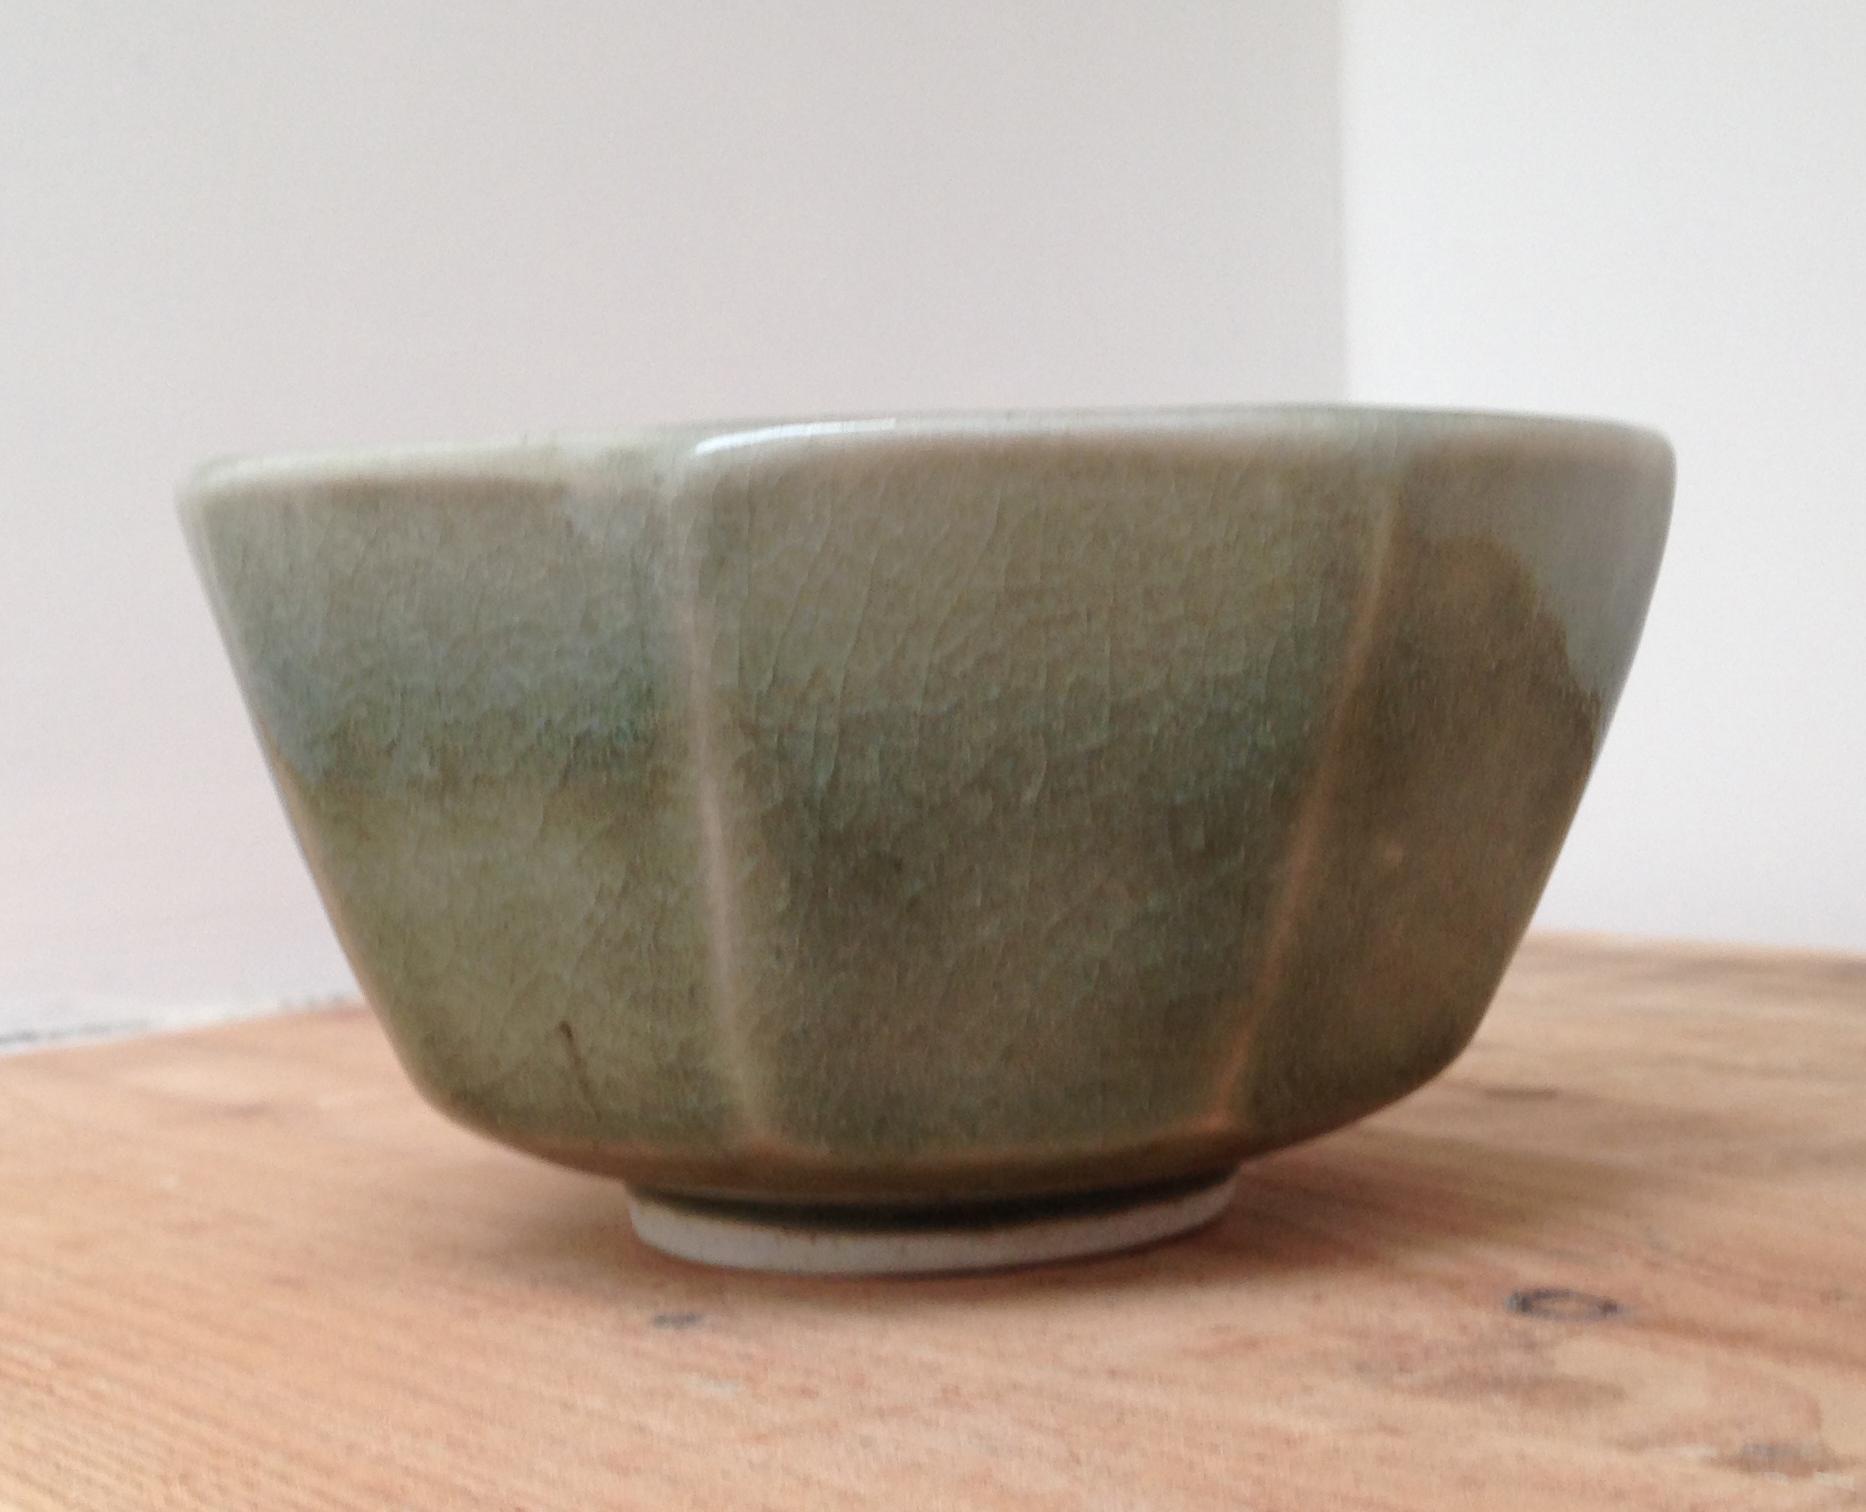 P e t e r S w a n s o n  Porcelain Cut Sided Bowl 140 mm x 70 mm  Jade Celadon £ 100